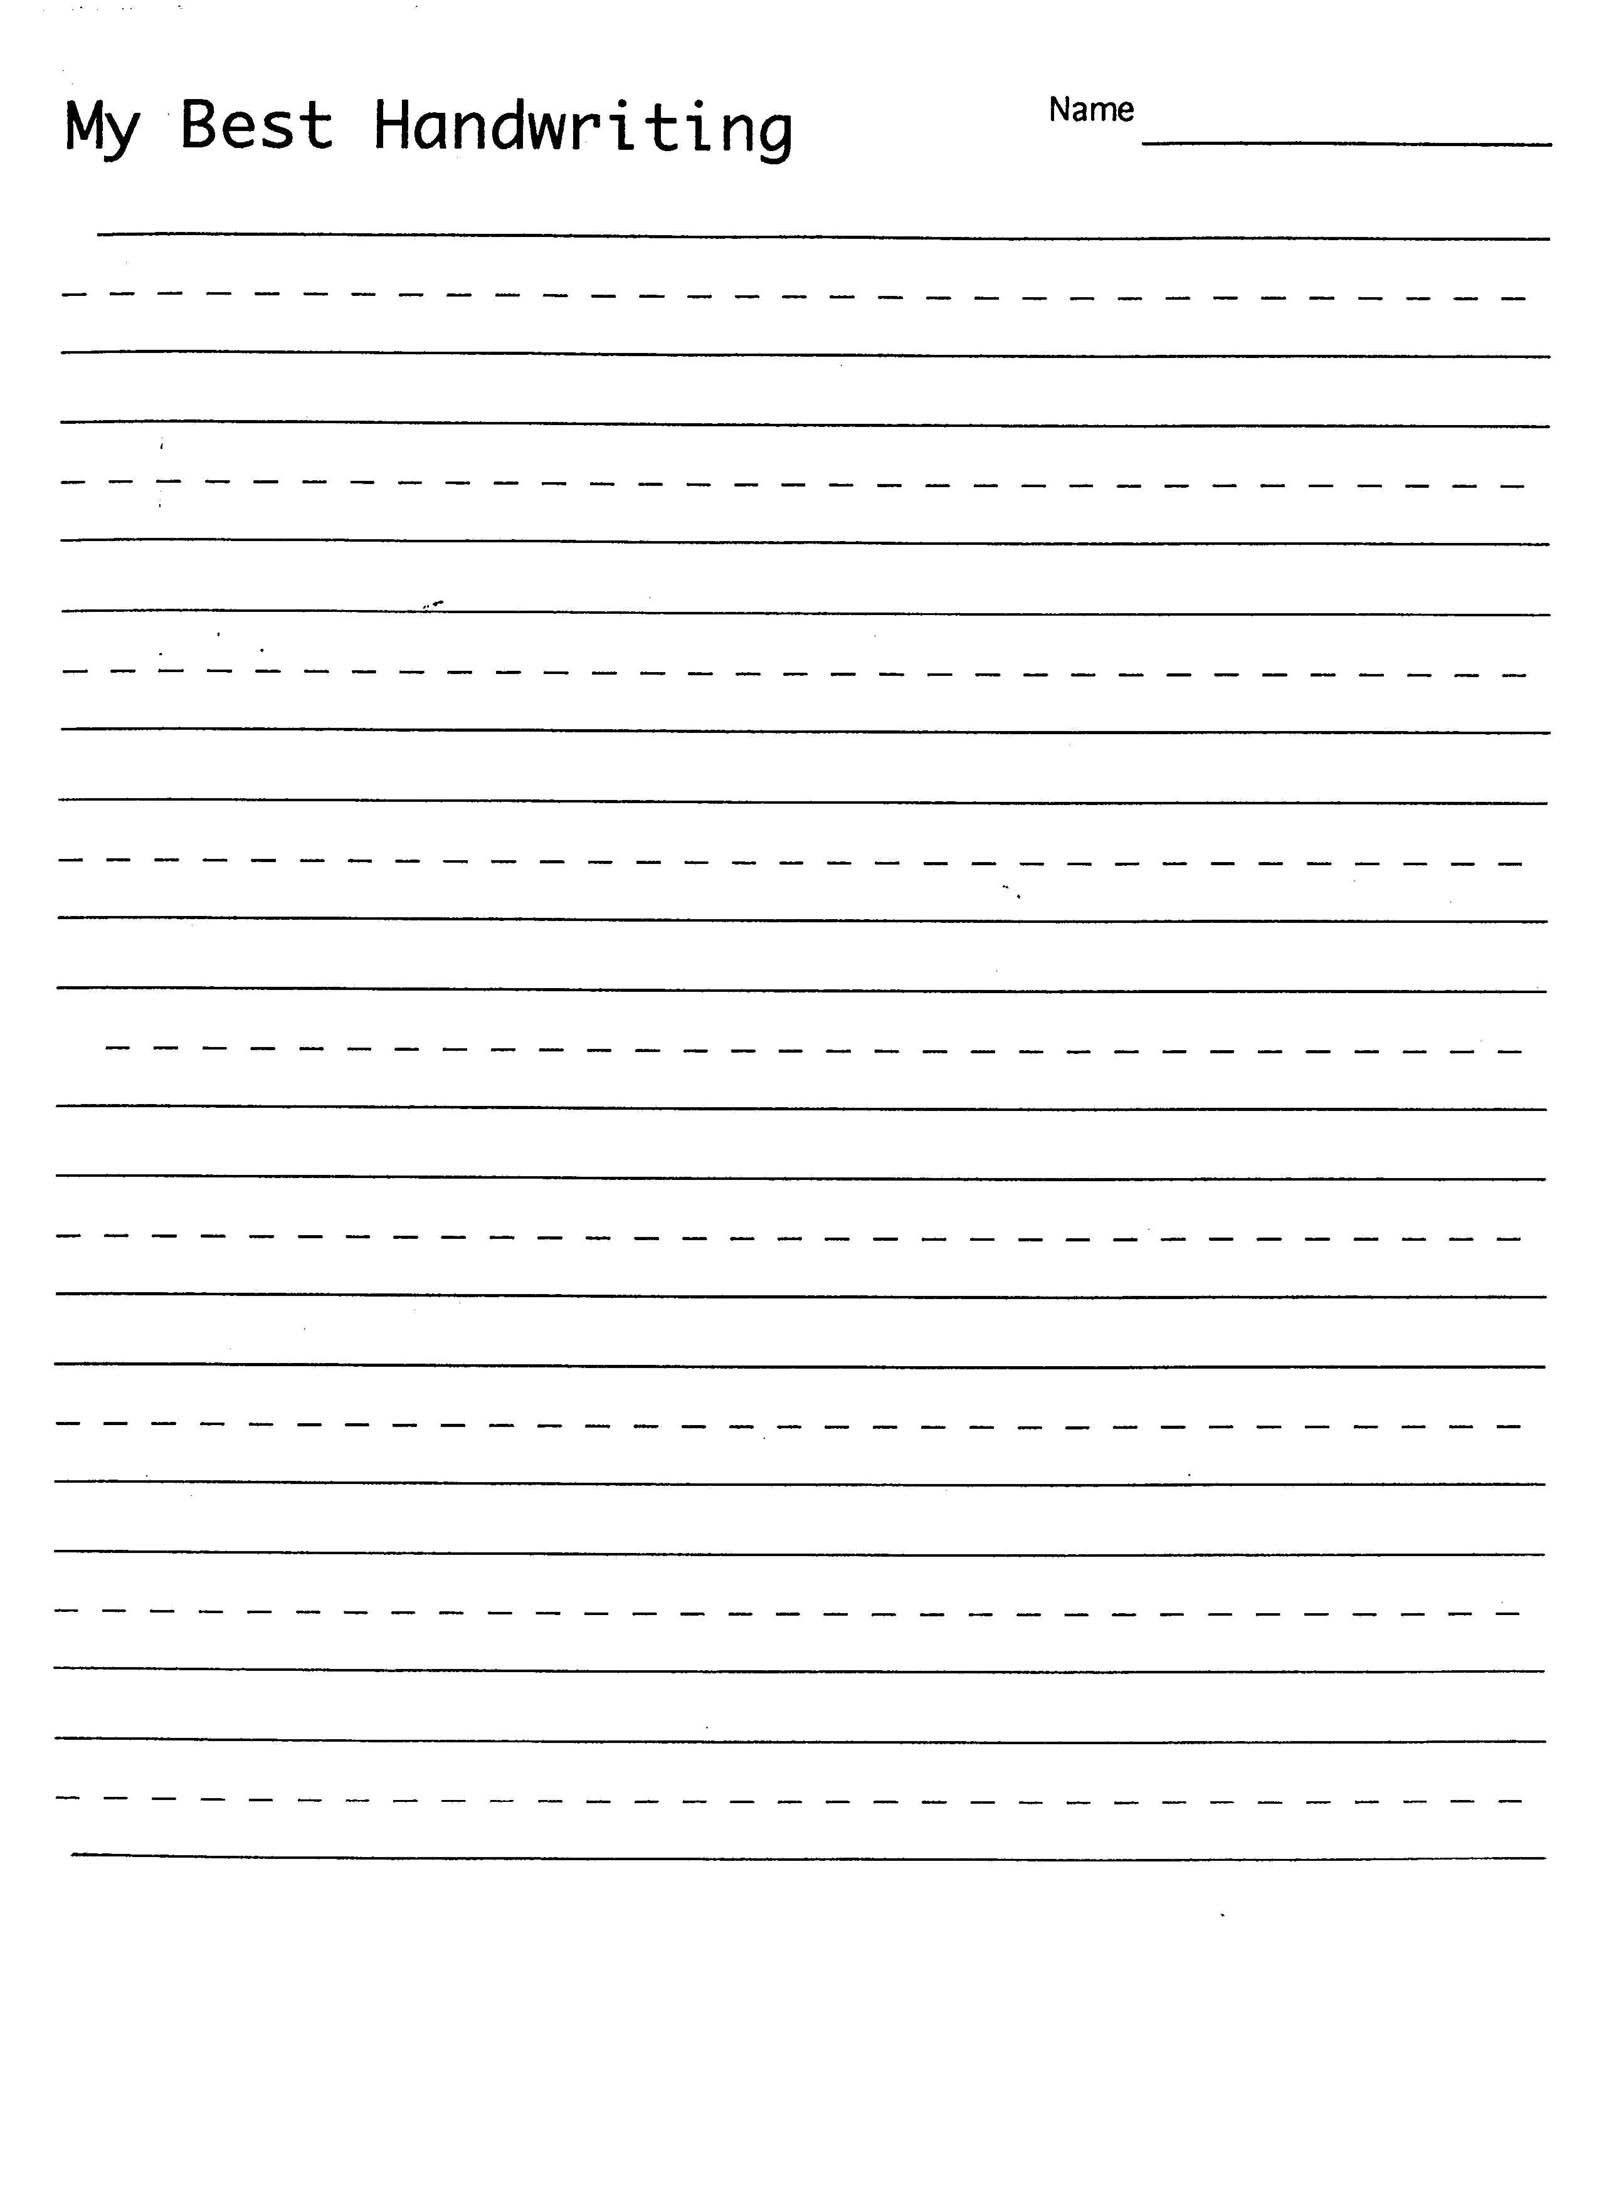 4th Grade Essay Writing Worksheets Essay Writing Worksheet Persuasive Essay Peer Editing In 2021 Essay Writing Grading Essays Peer Editing [ 2200 x 1599 Pixel ]